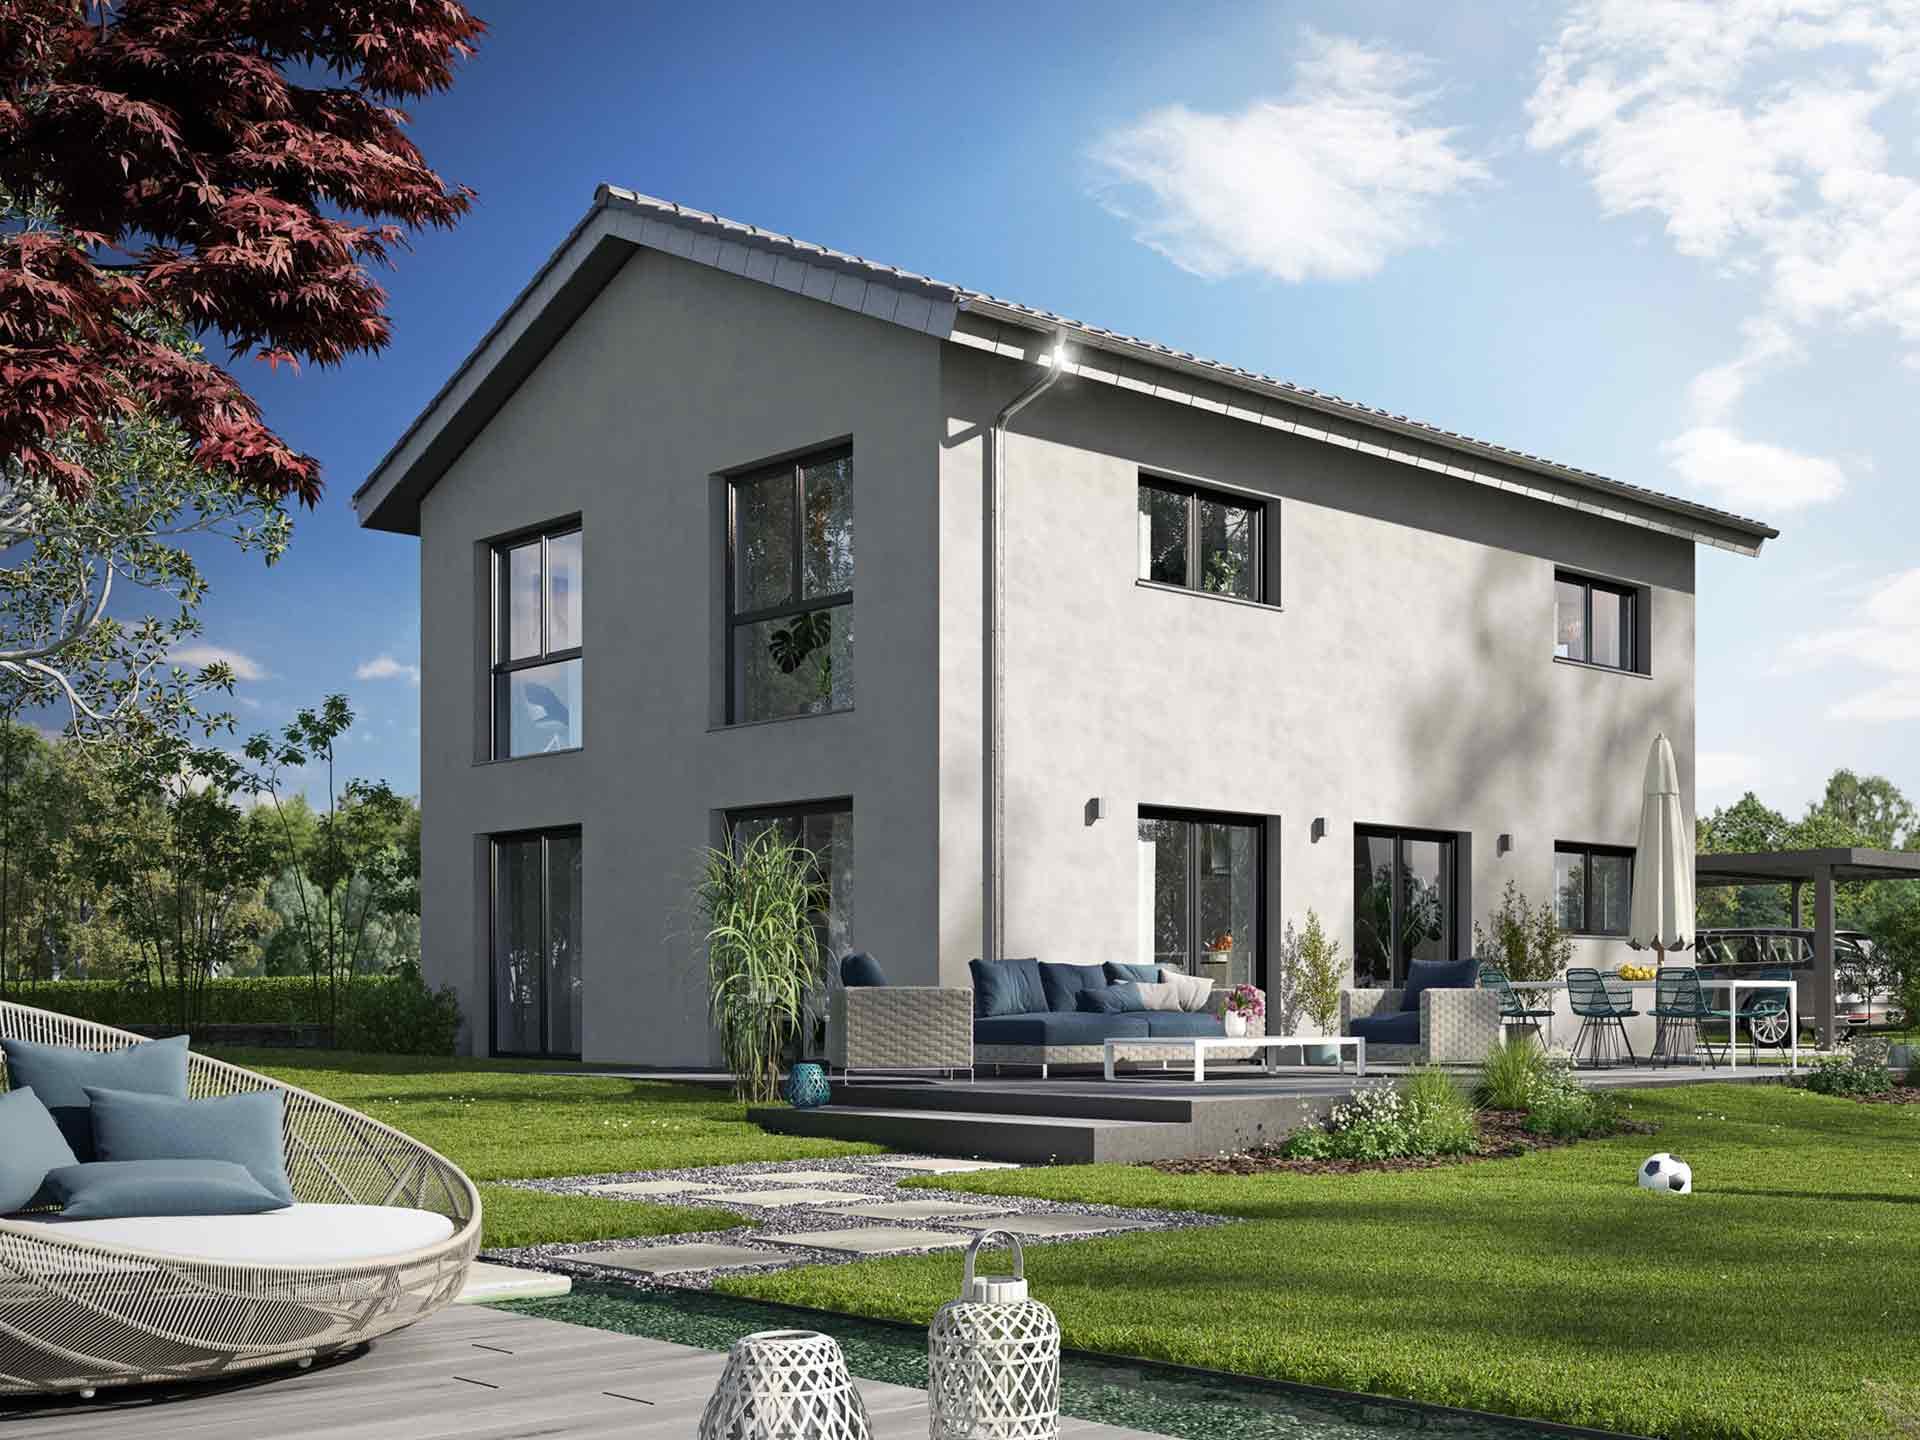 Dennert Massivhaus GmbH - Hauptbild